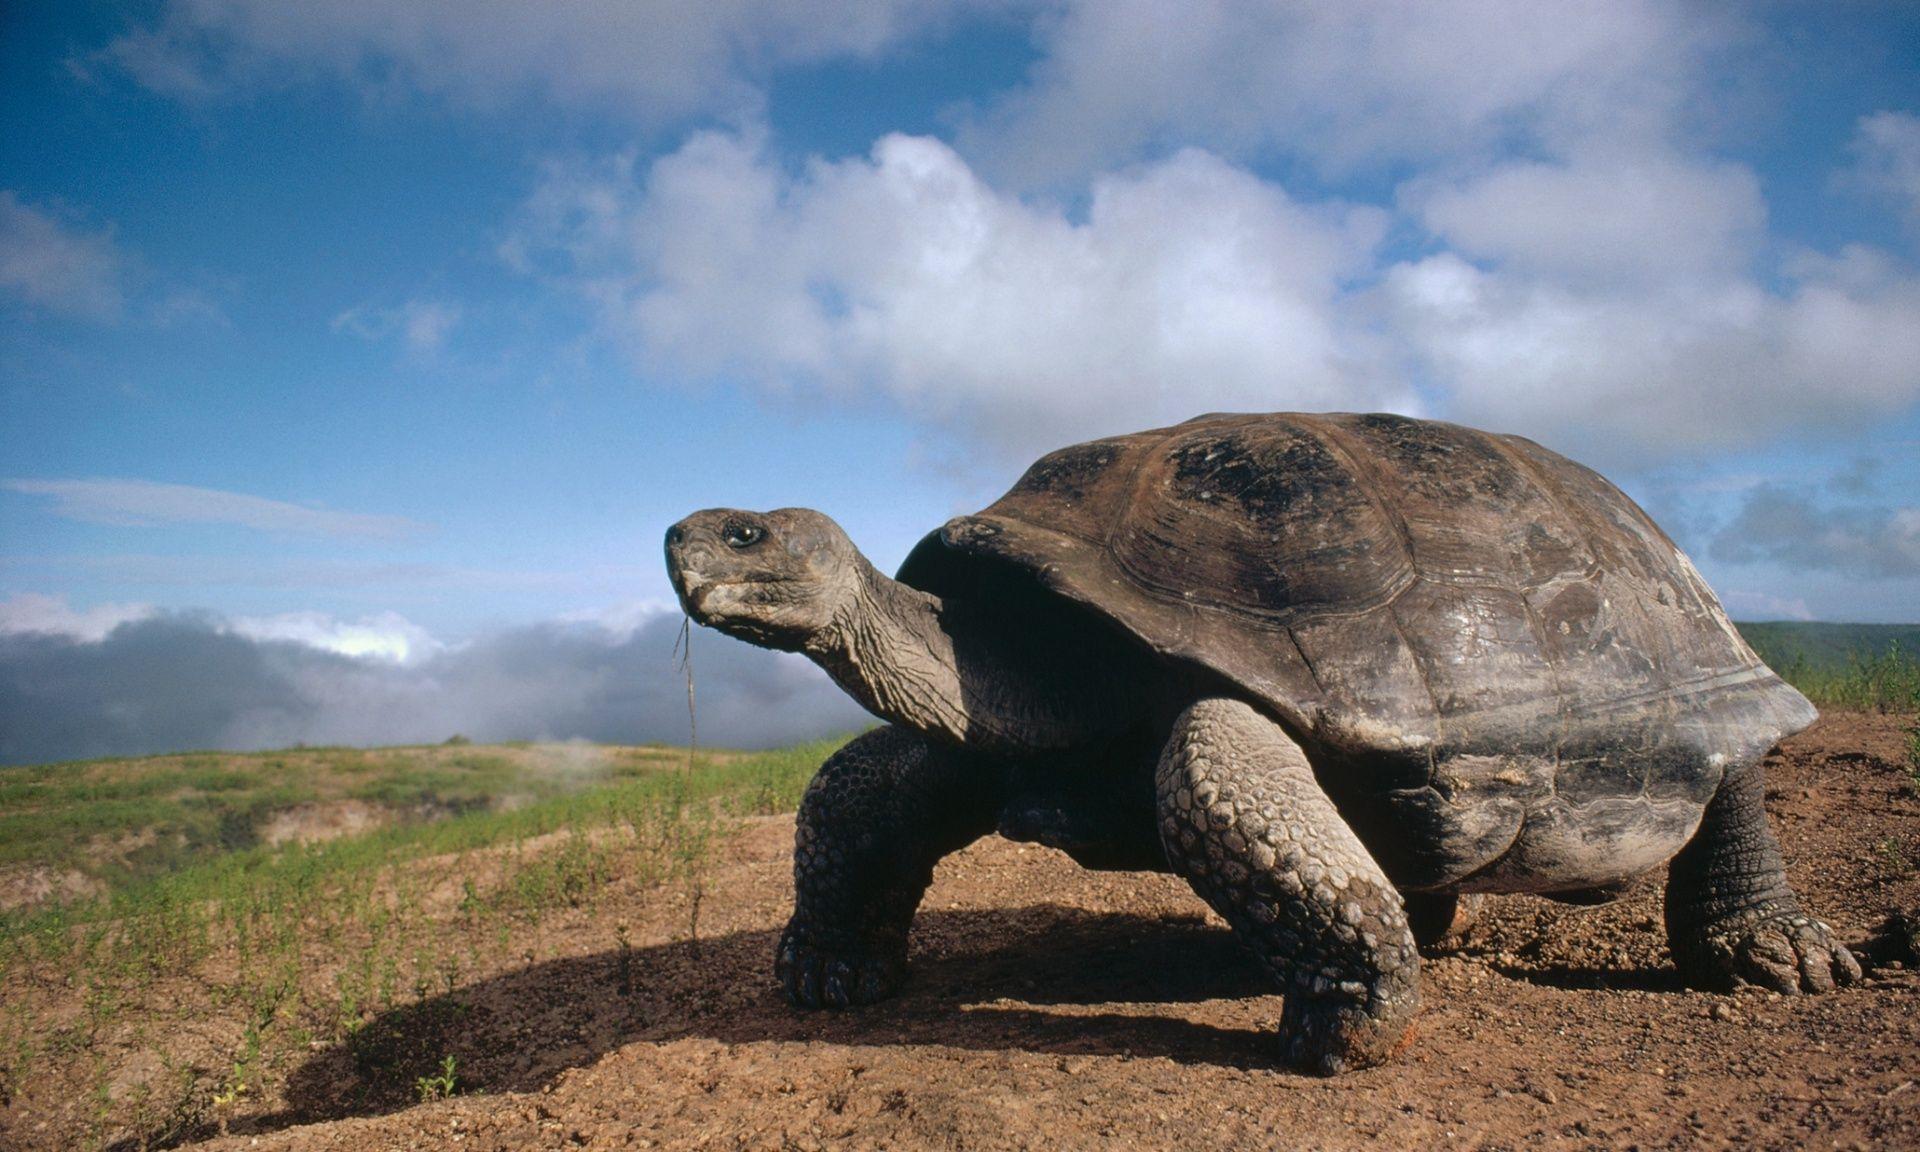 Shelf Life: Turtles and taxonomy | @GrrlScientist